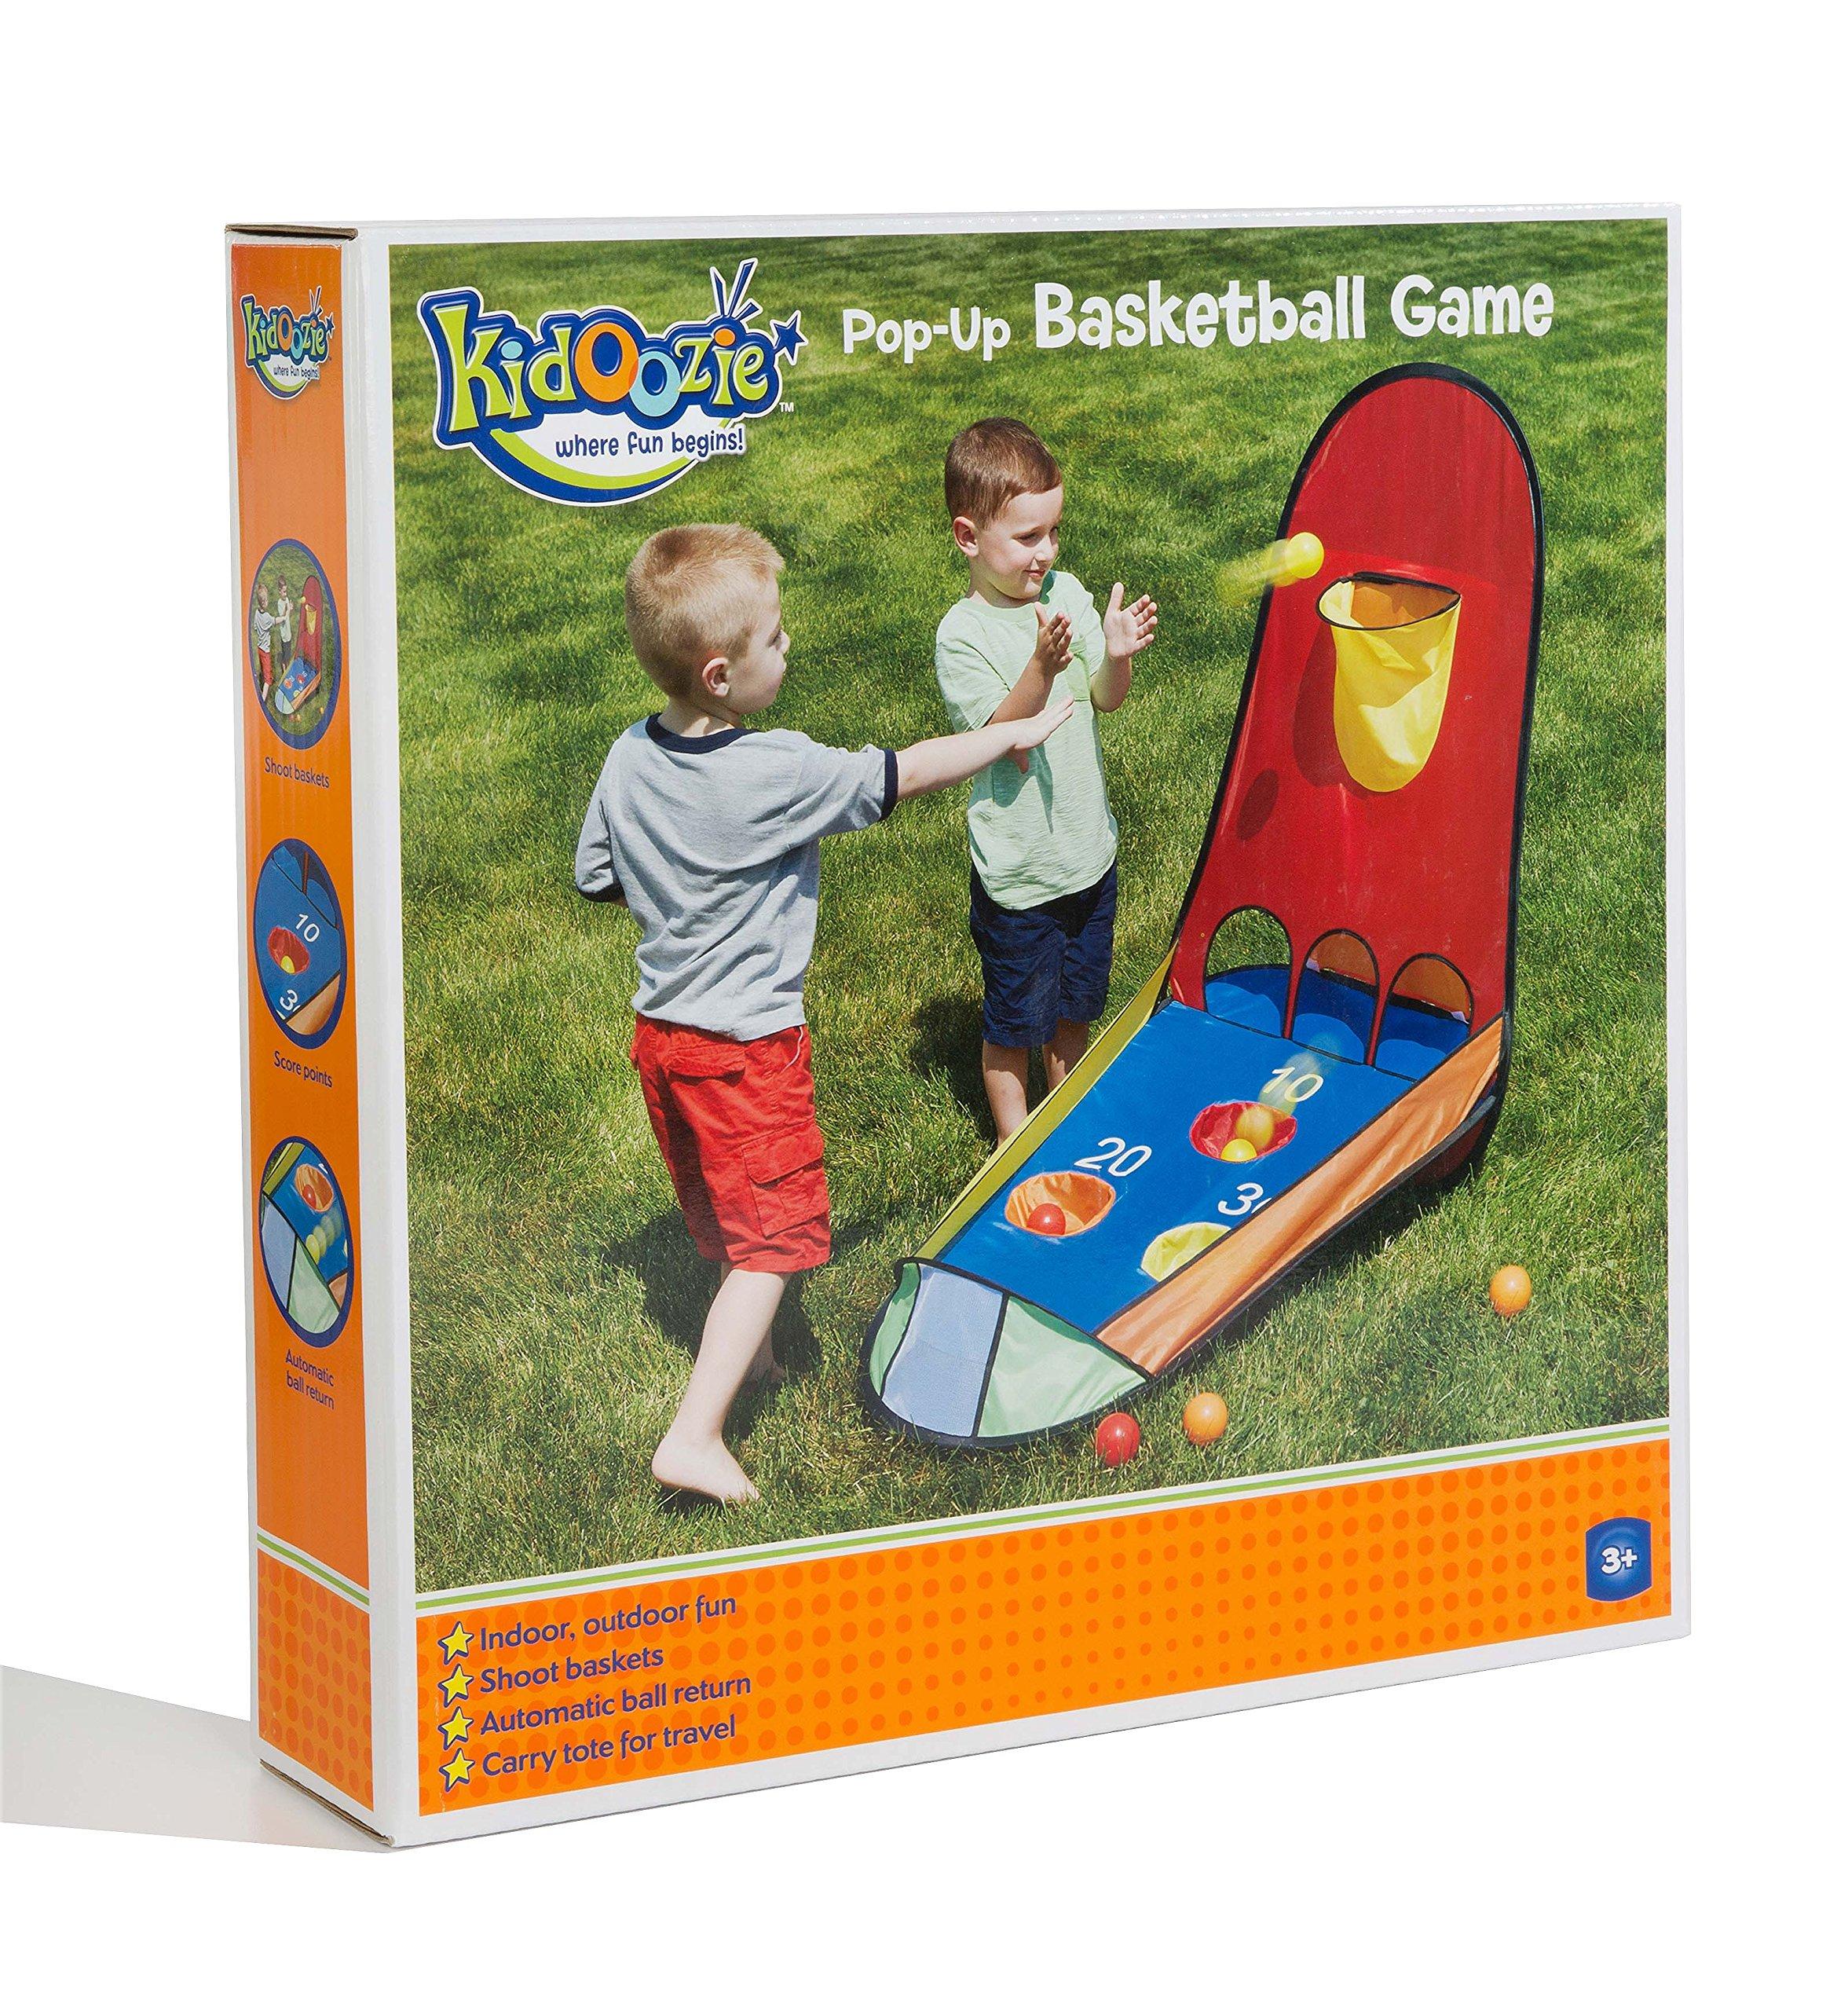 Kidoozie Pop-Up Basketball Game - 3+